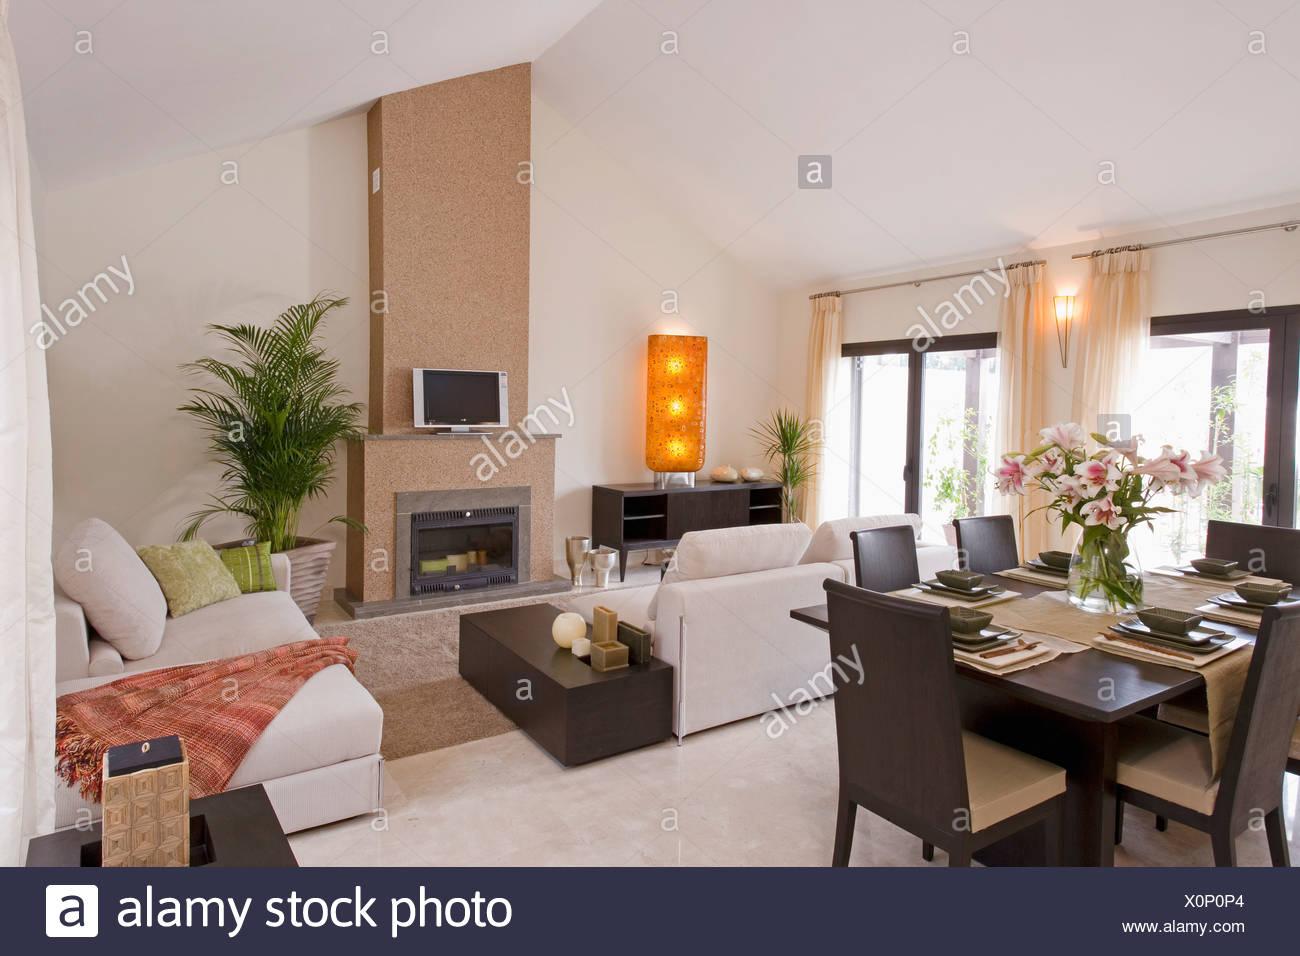 Country interiors livingrooms modern stockfotos country for Braune ledersessel